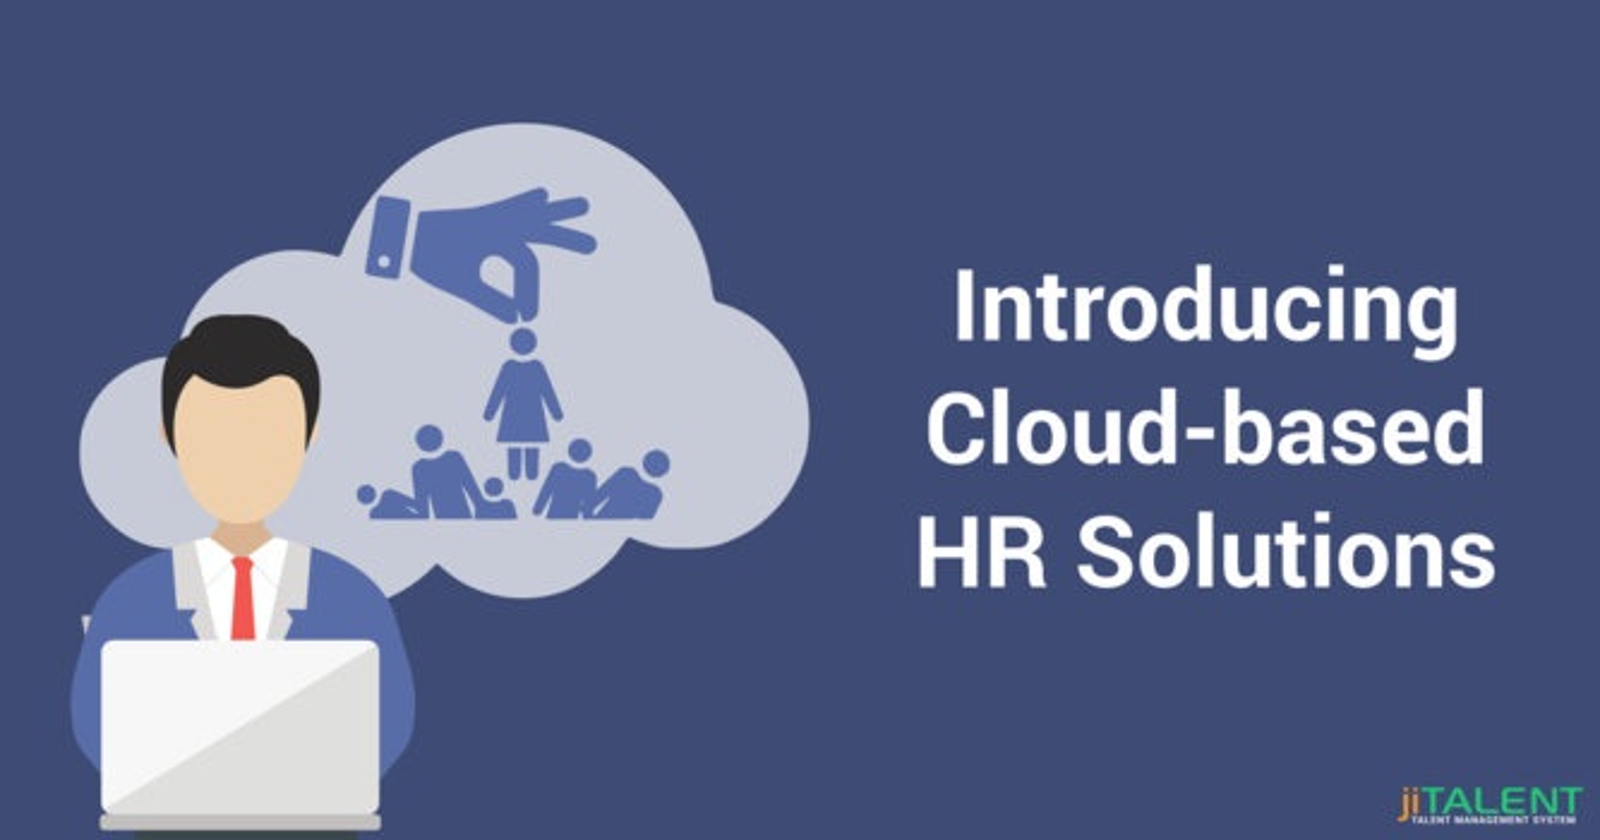 Heading towards Cloud-based HR solution